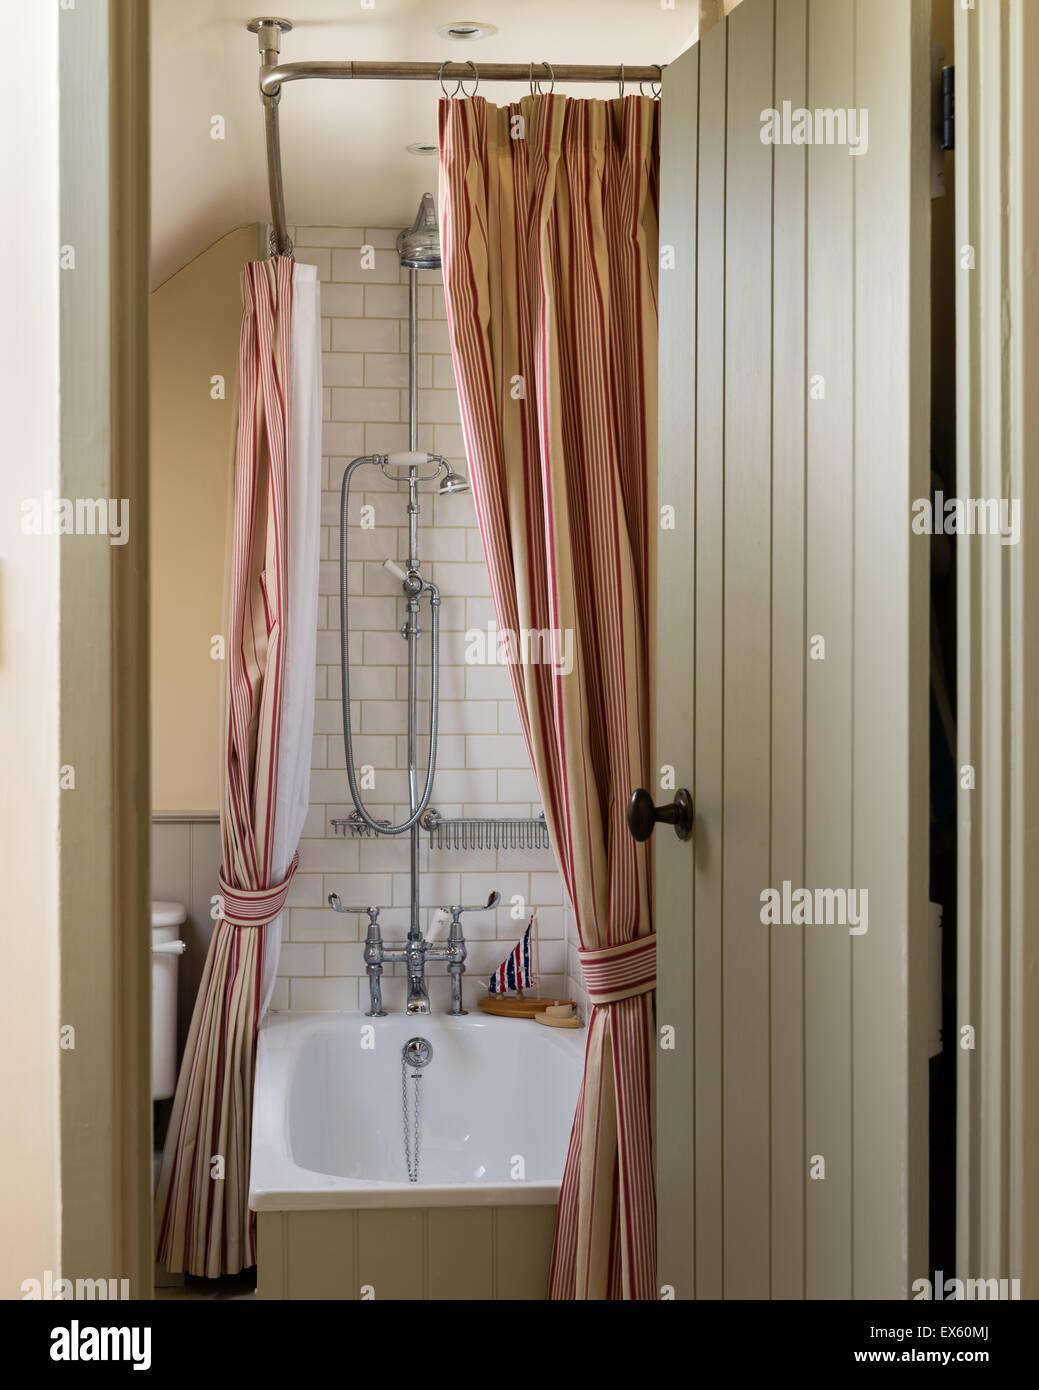 View Through Open Door To Bathroom The Shower Curtain Is